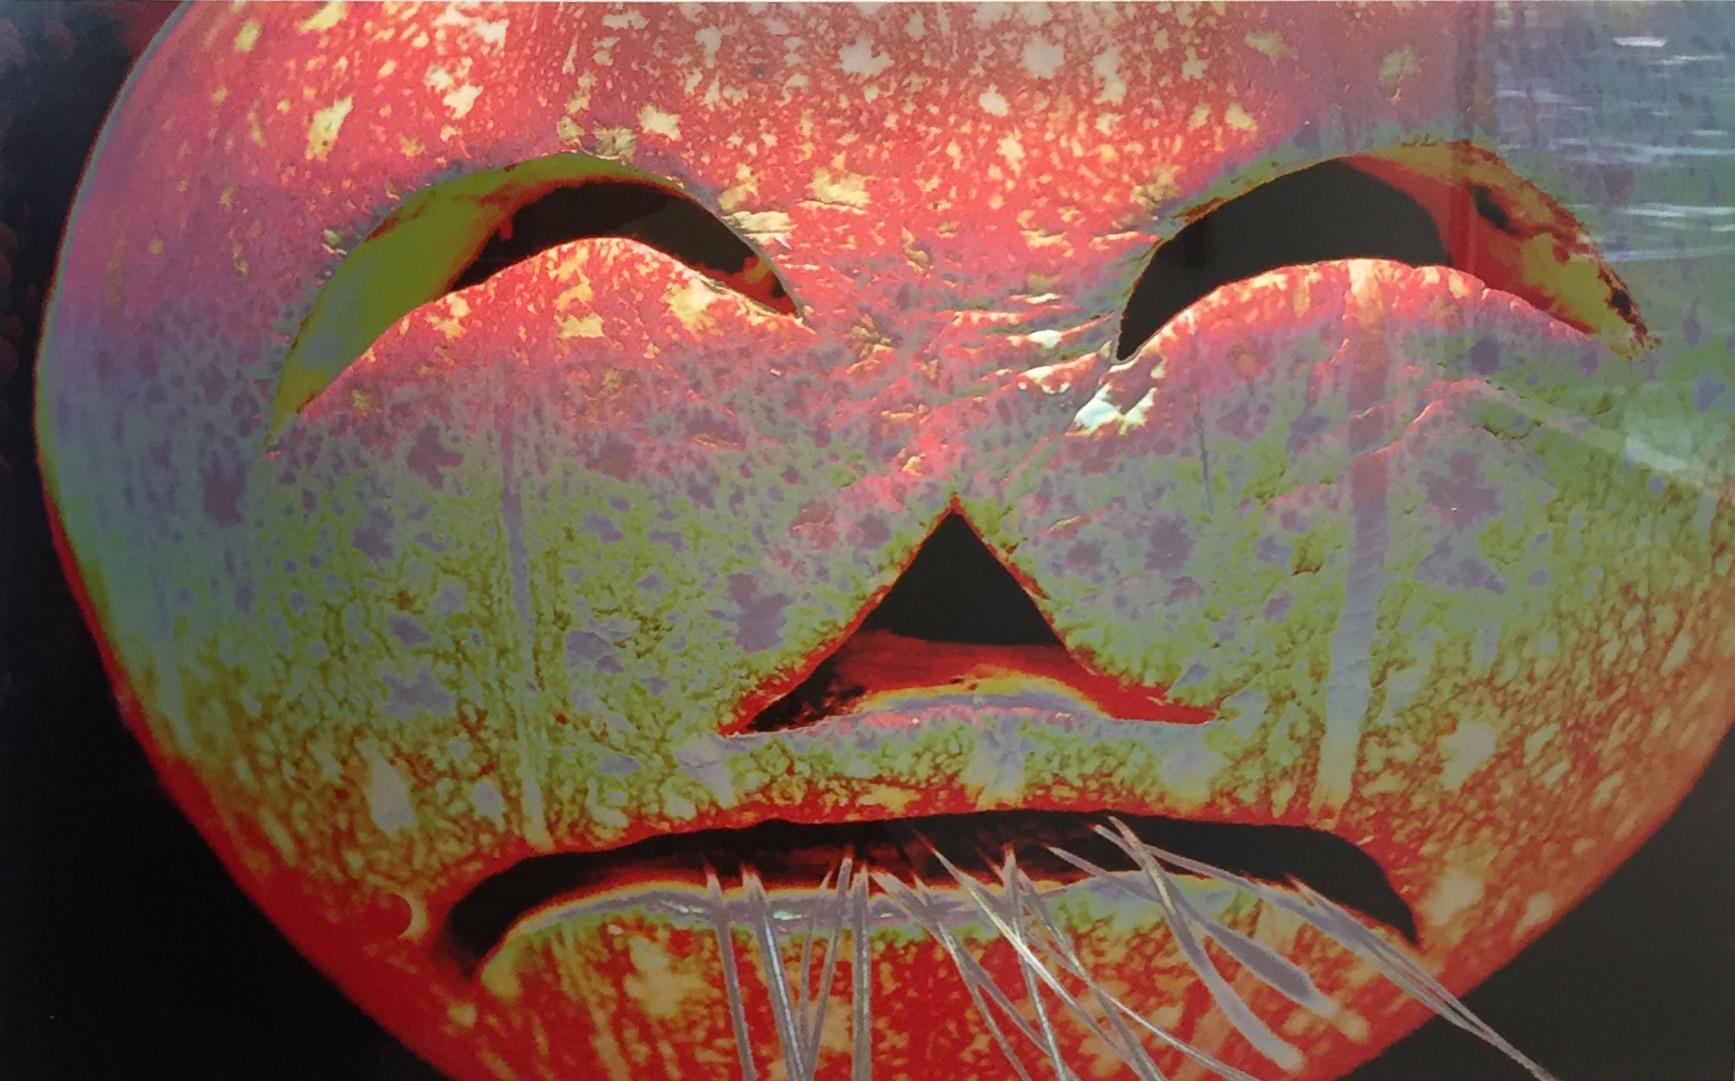 Pumpkin Gon Bad Steve Marts.jpg